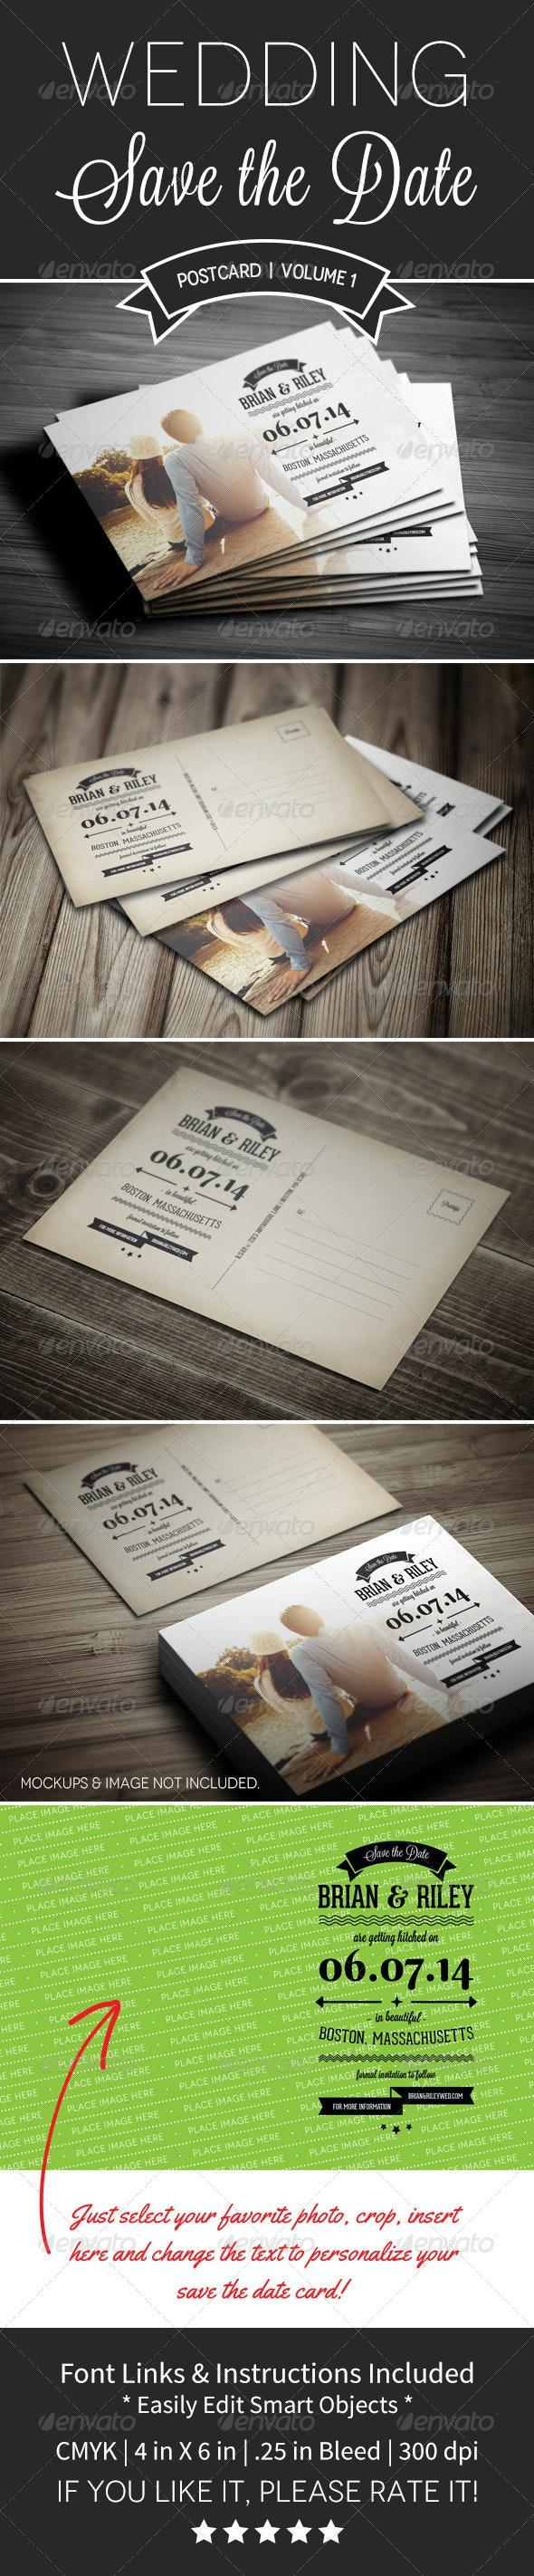 Save The Date Postcard | Volume 1 - Weddings Cards & Invites